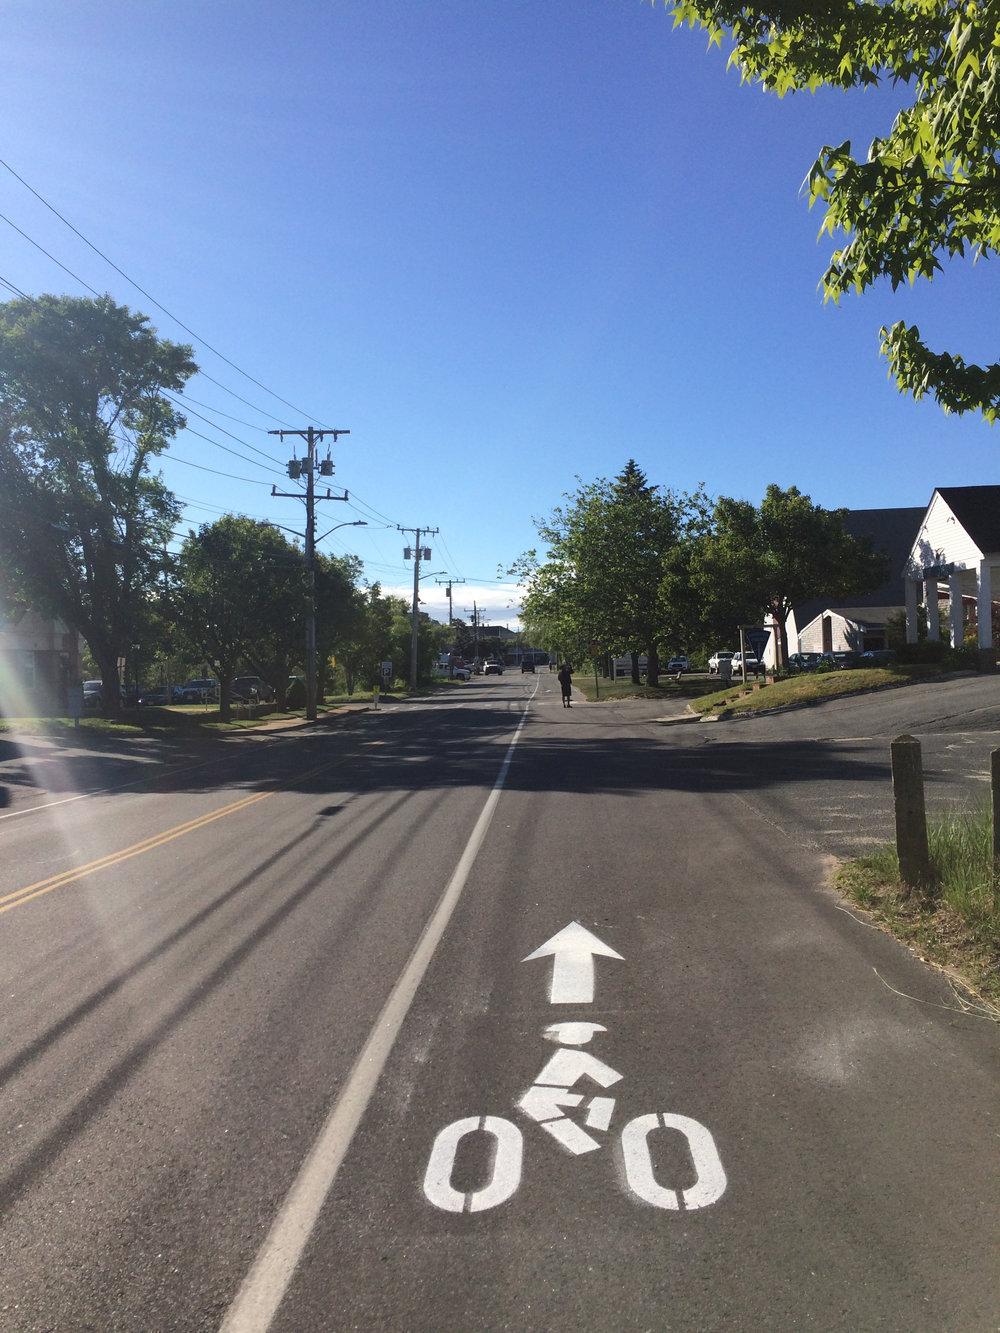 The new Shank Painter Road bike lane markings